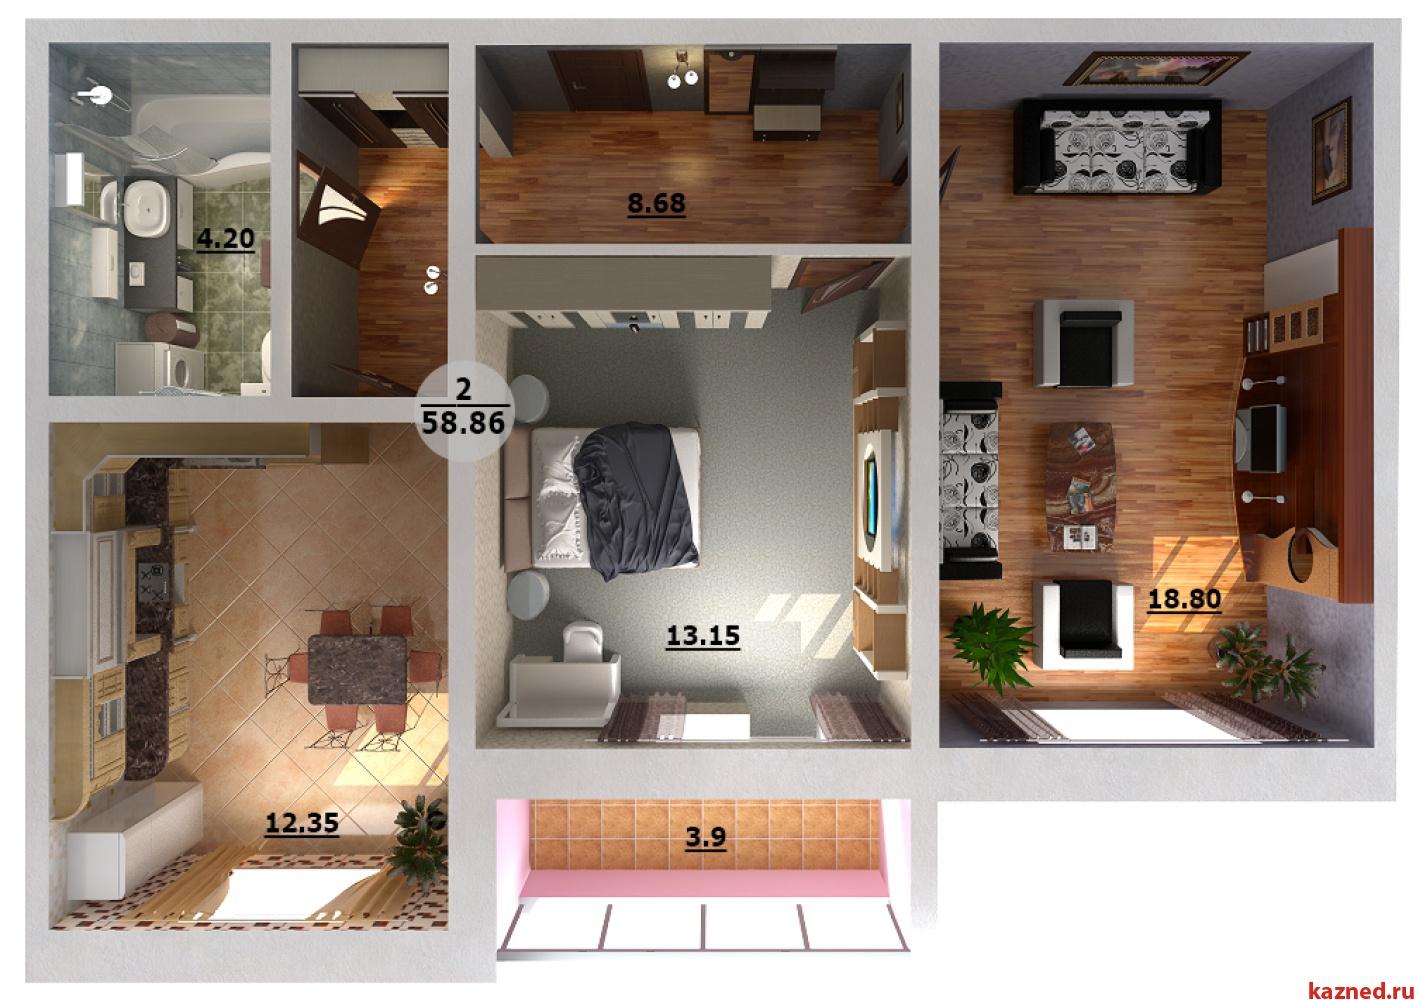 Продажа 2-к квартиры Н.Рахлина 7, 60 м² (миниатюра №6)